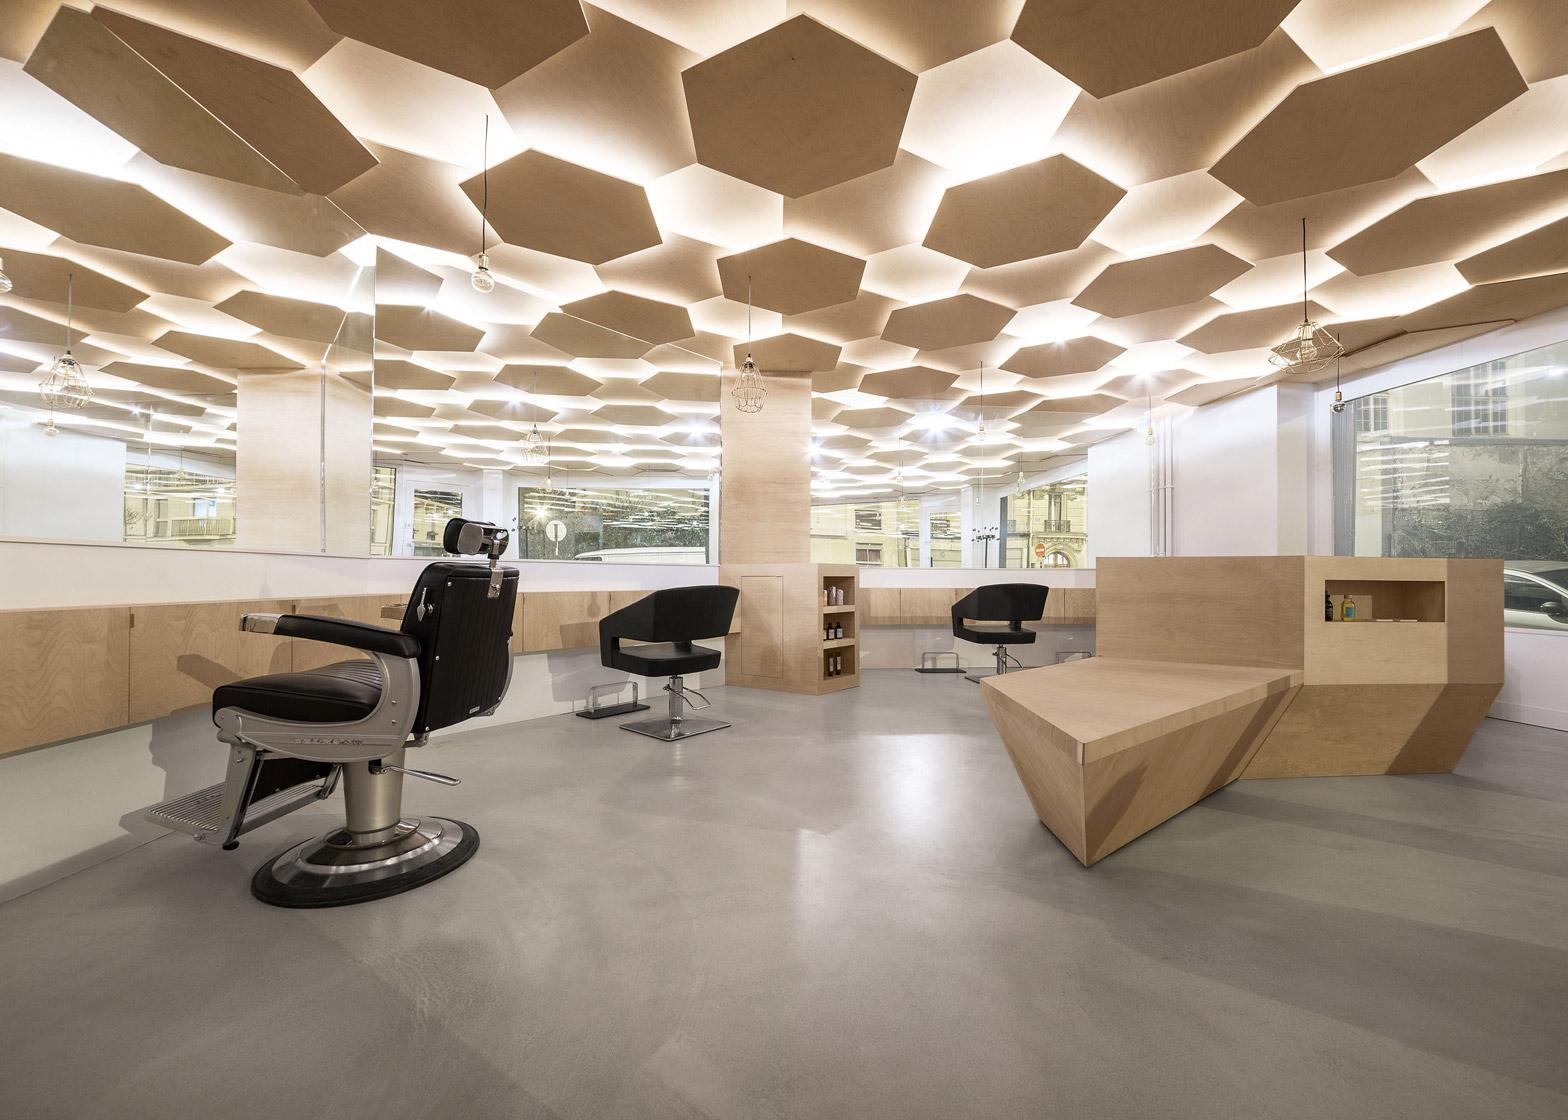 architecture_barber_shop_design_studia_interiors_osnovadesign_osnova_poltava_07